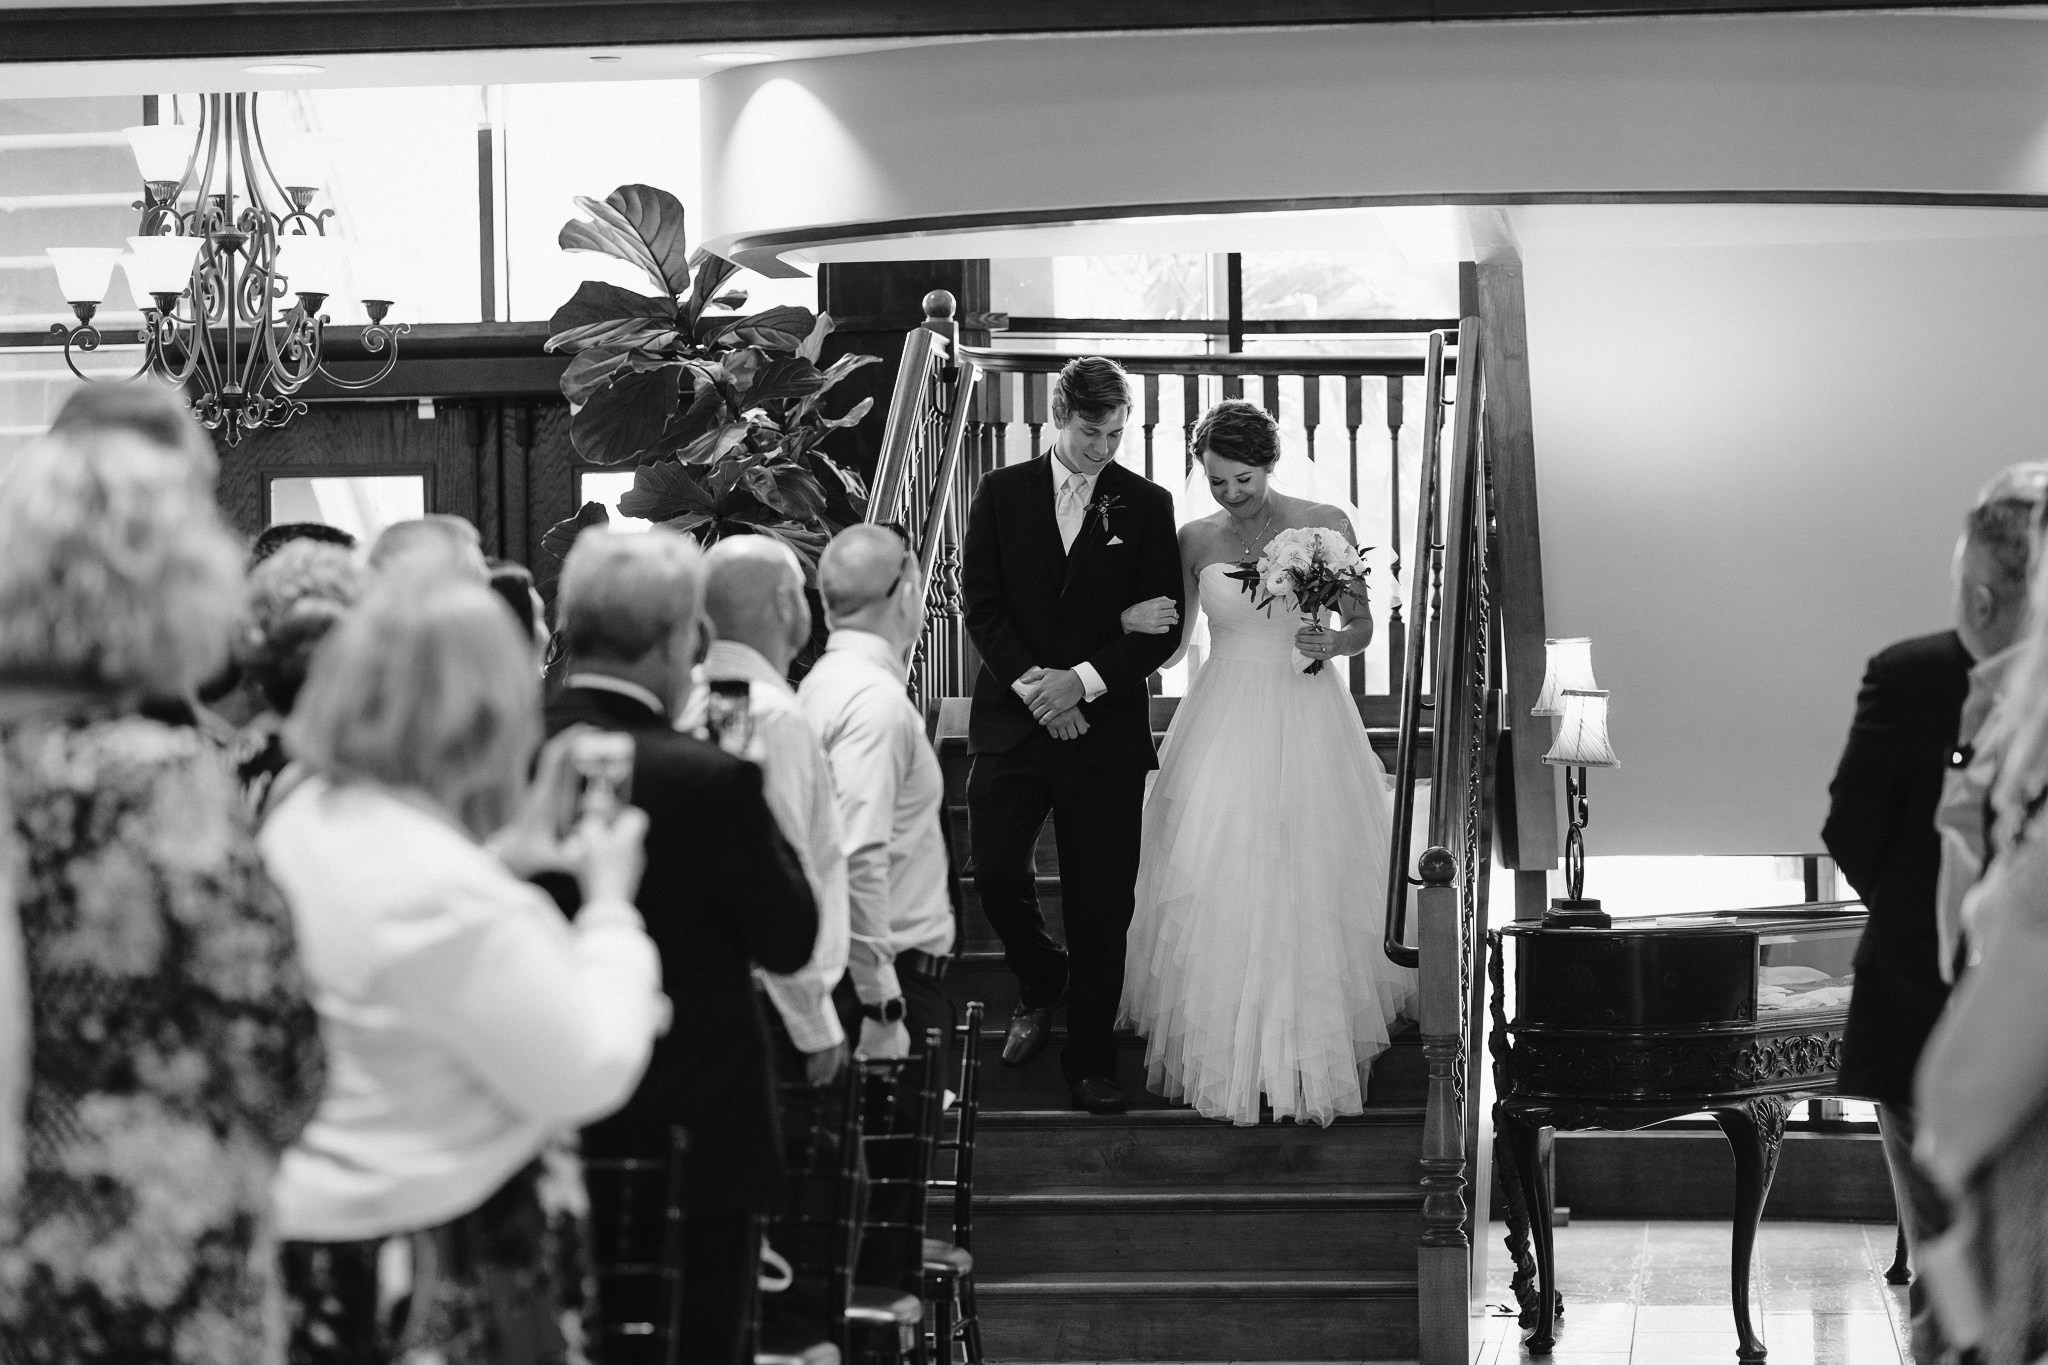 Tavares+Pavilion+on+the+Lake+Wedding+Florida_020.jpg